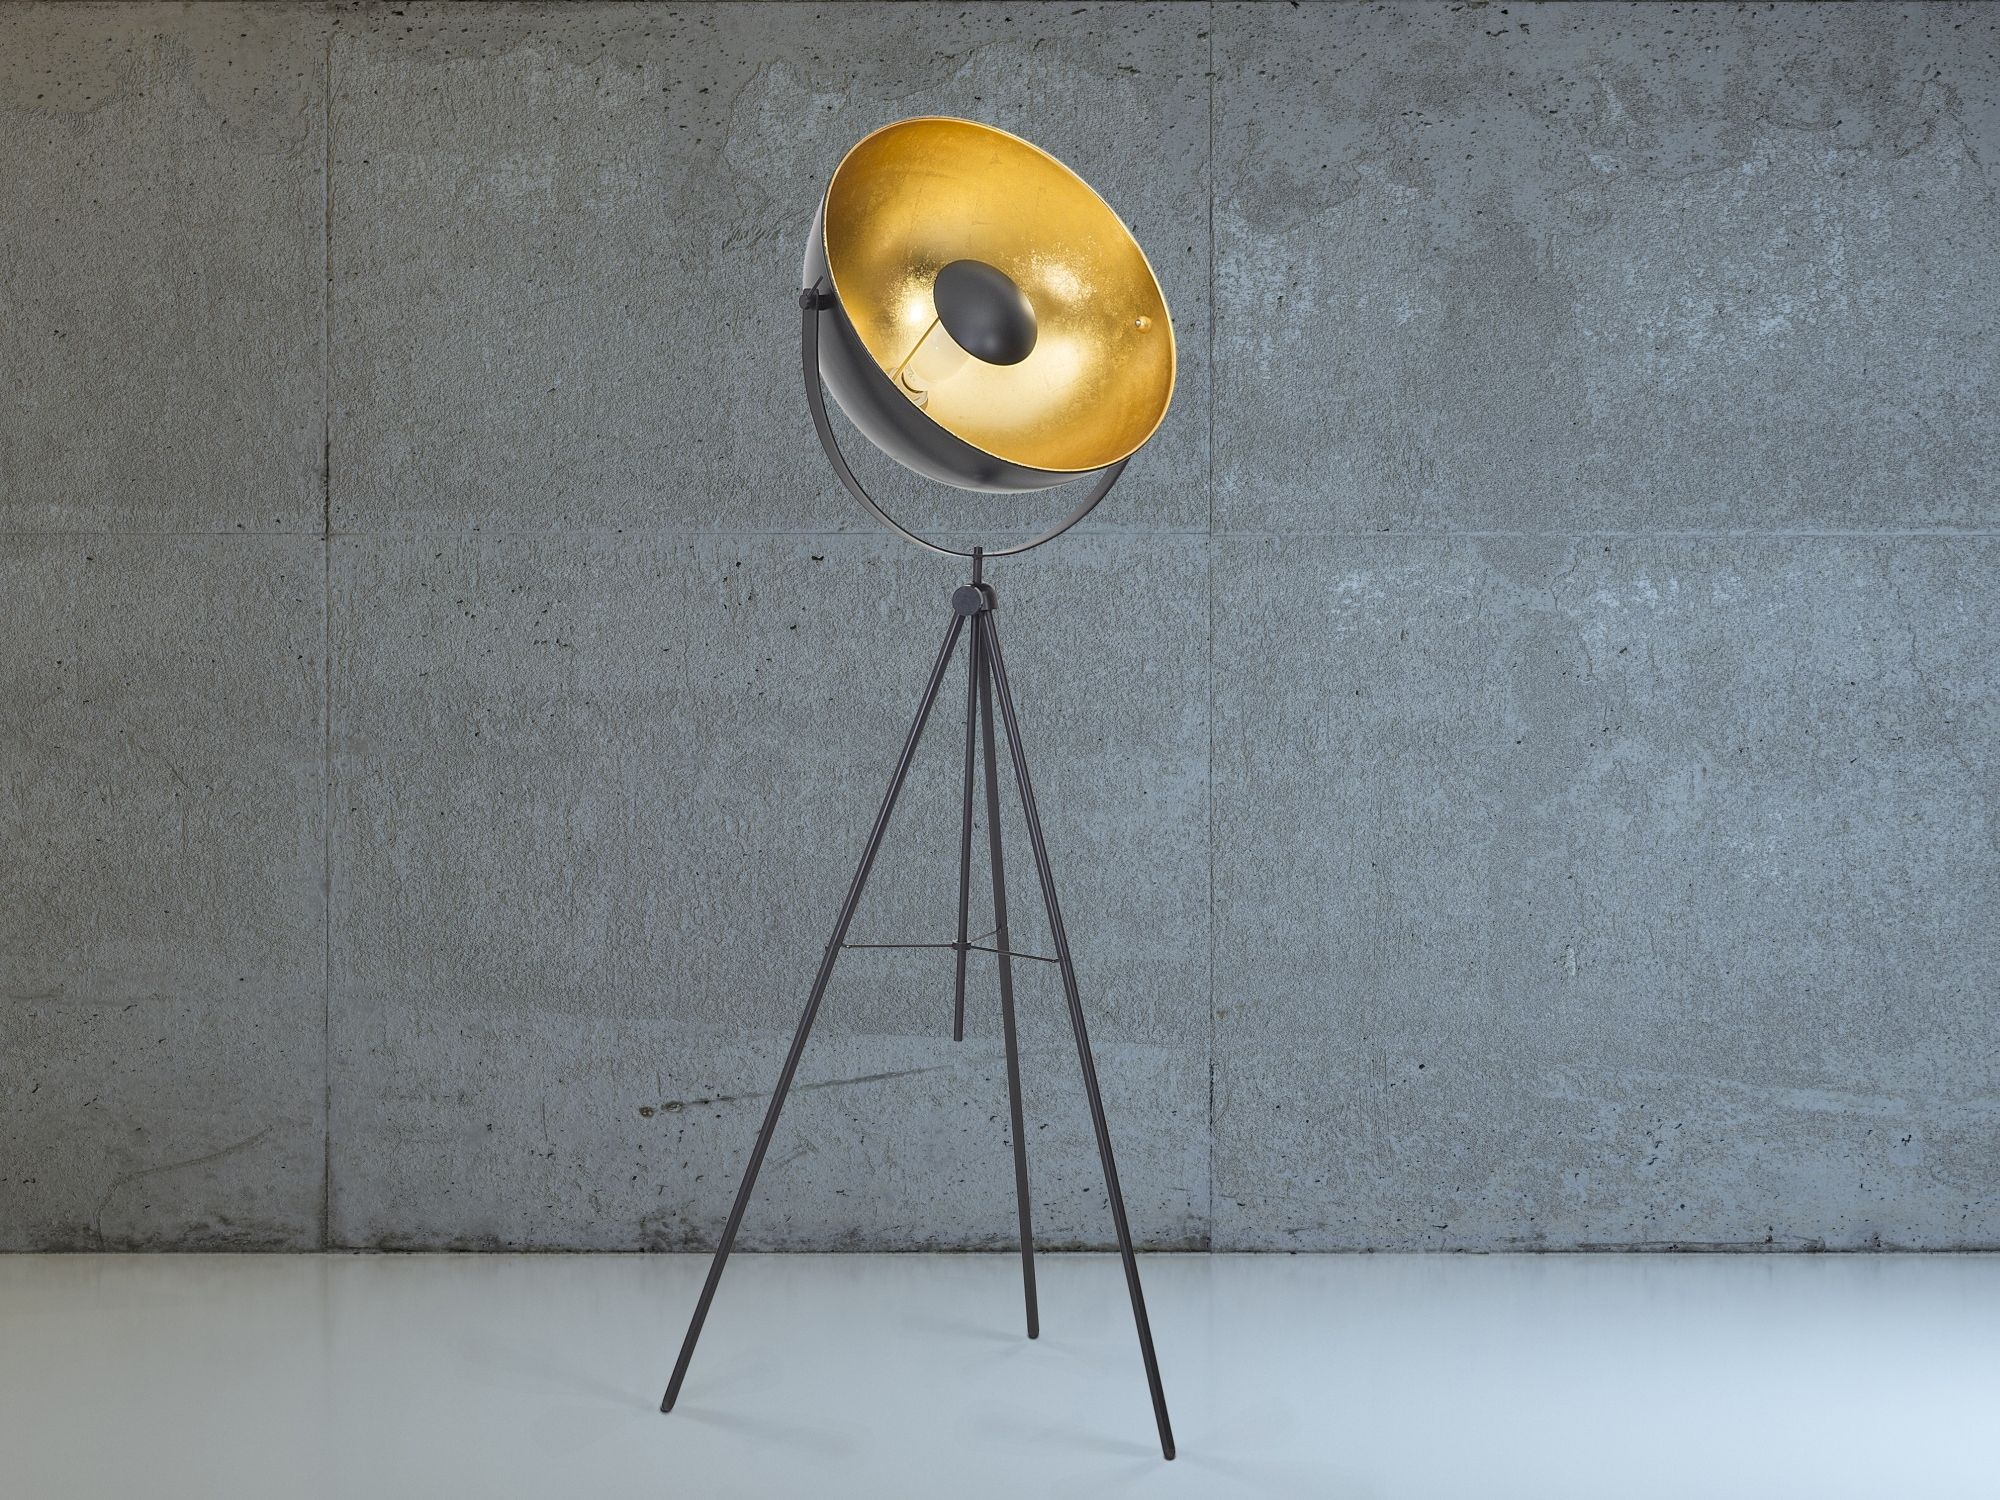 Staande lamp zwart stalamp leeslamp verlichting thames